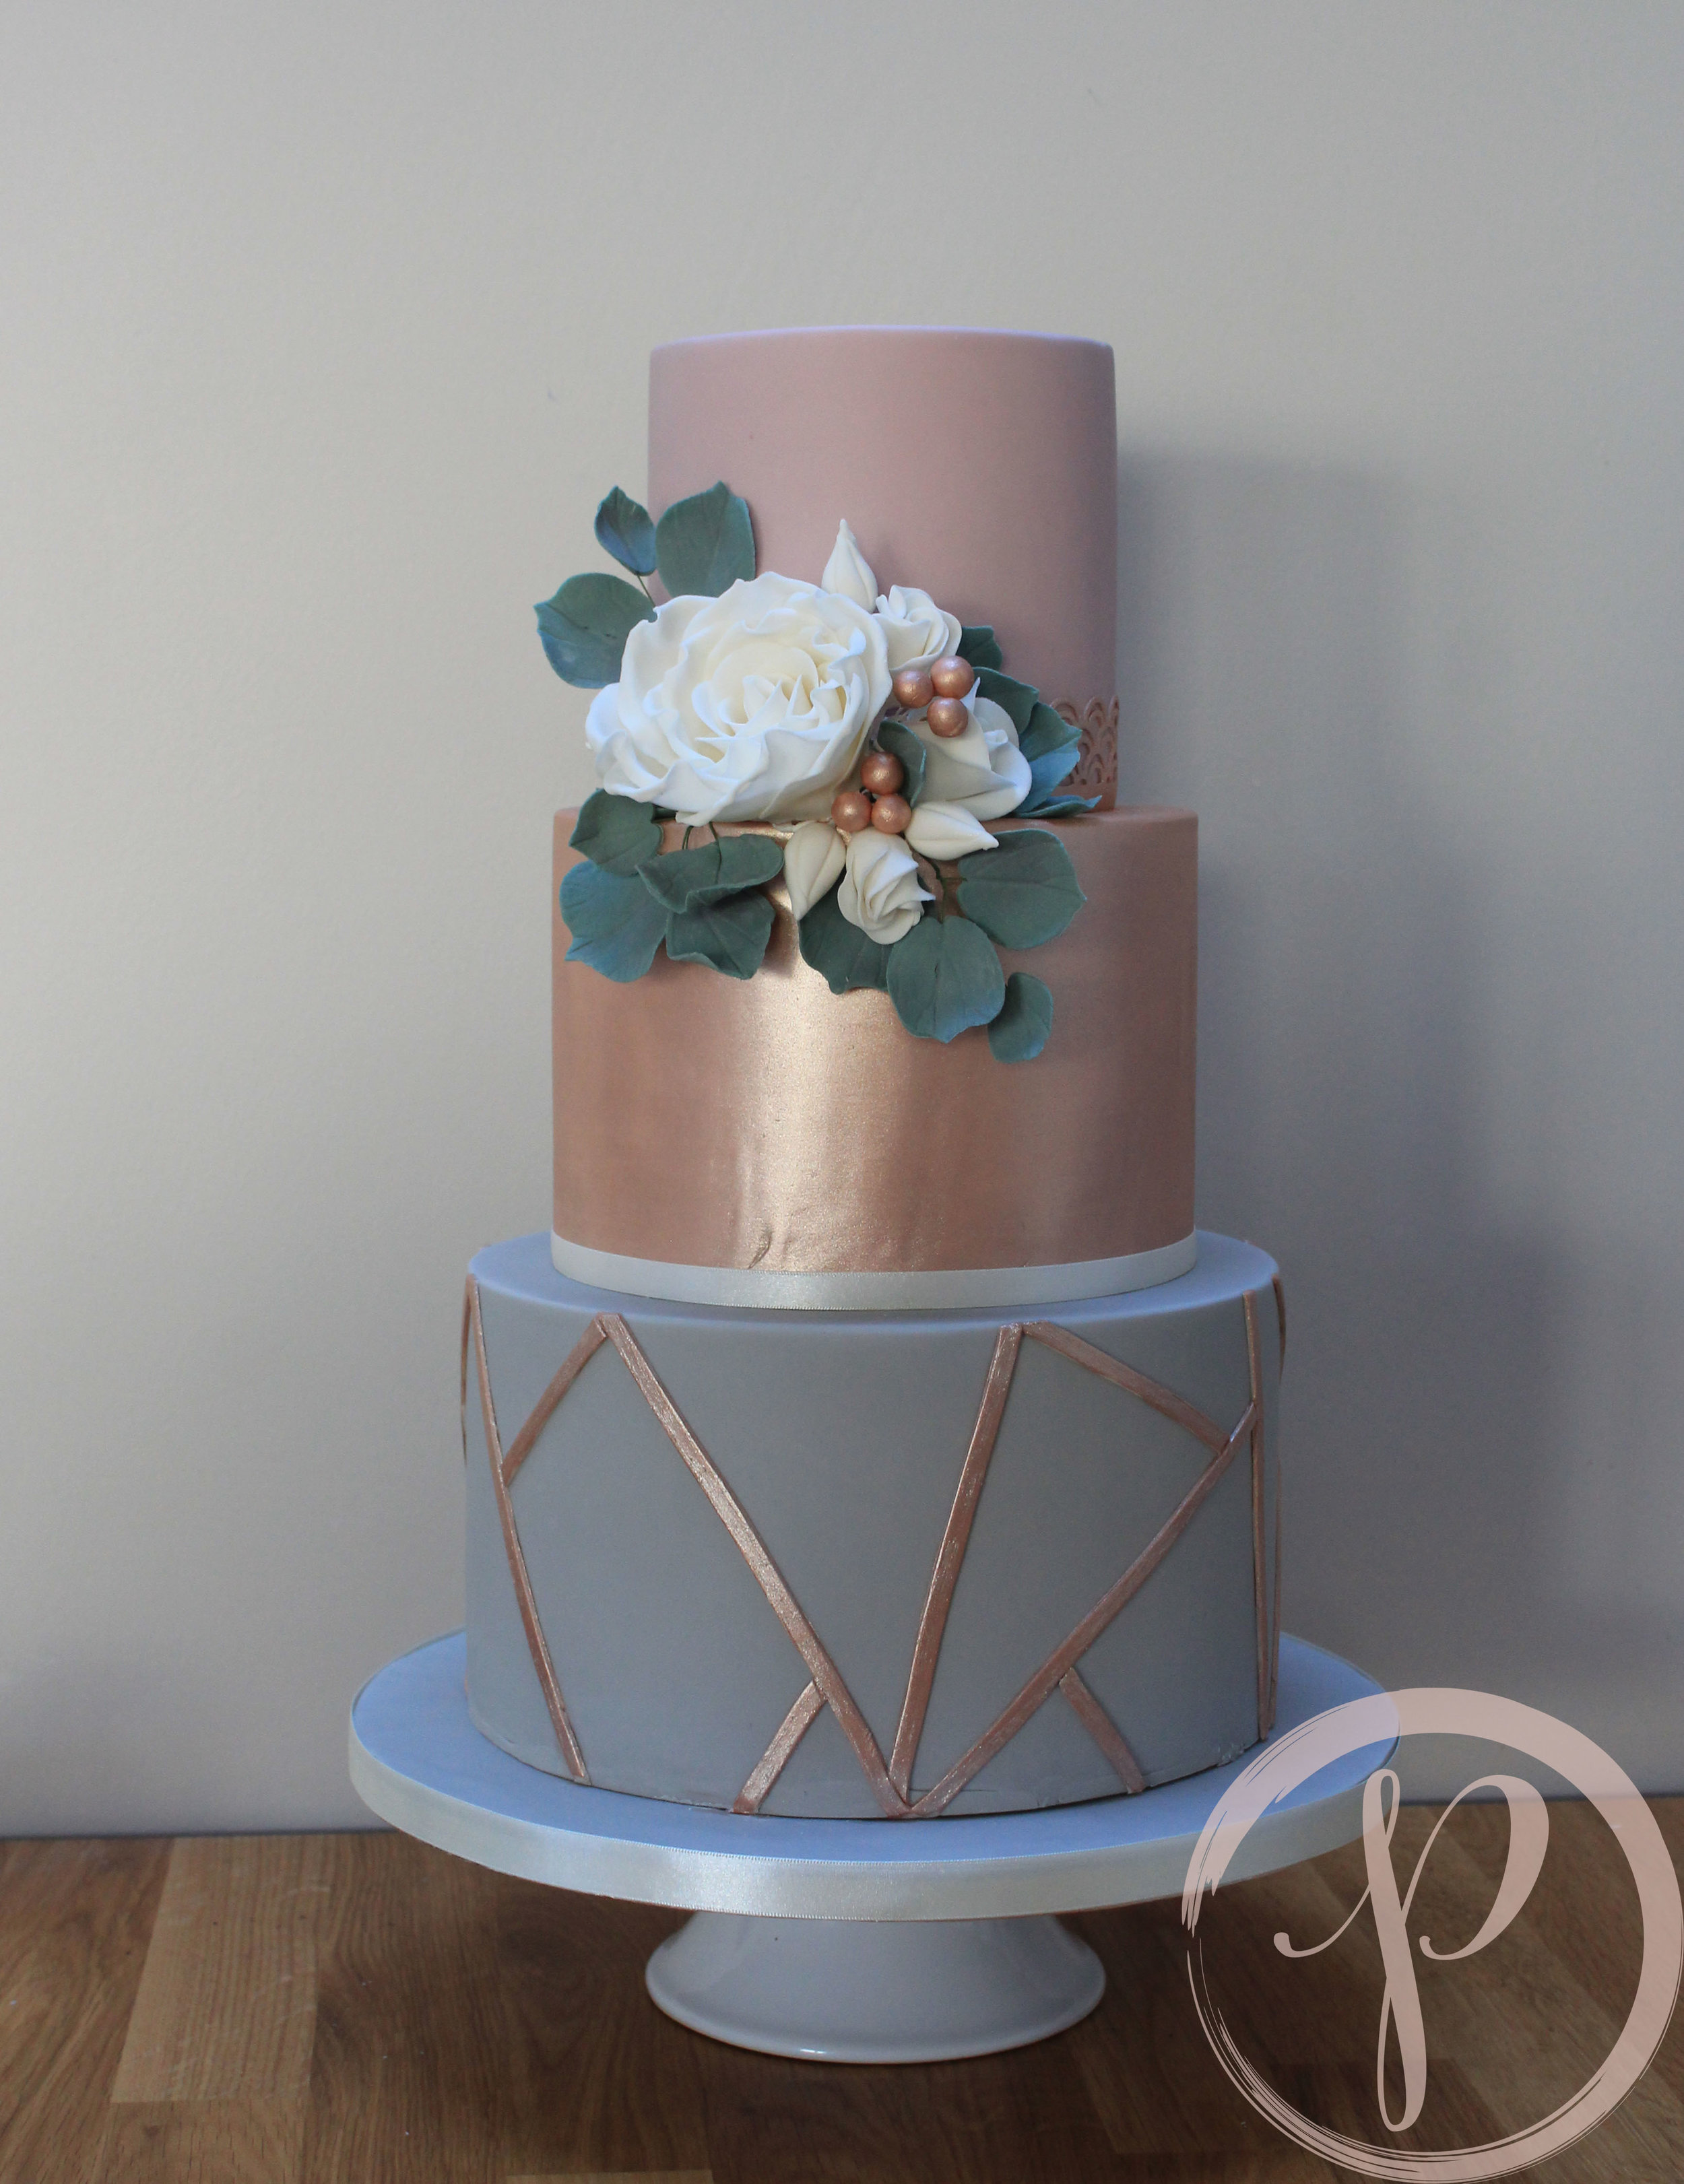 geometric wedding cake rose gold sugar flowers.jpg